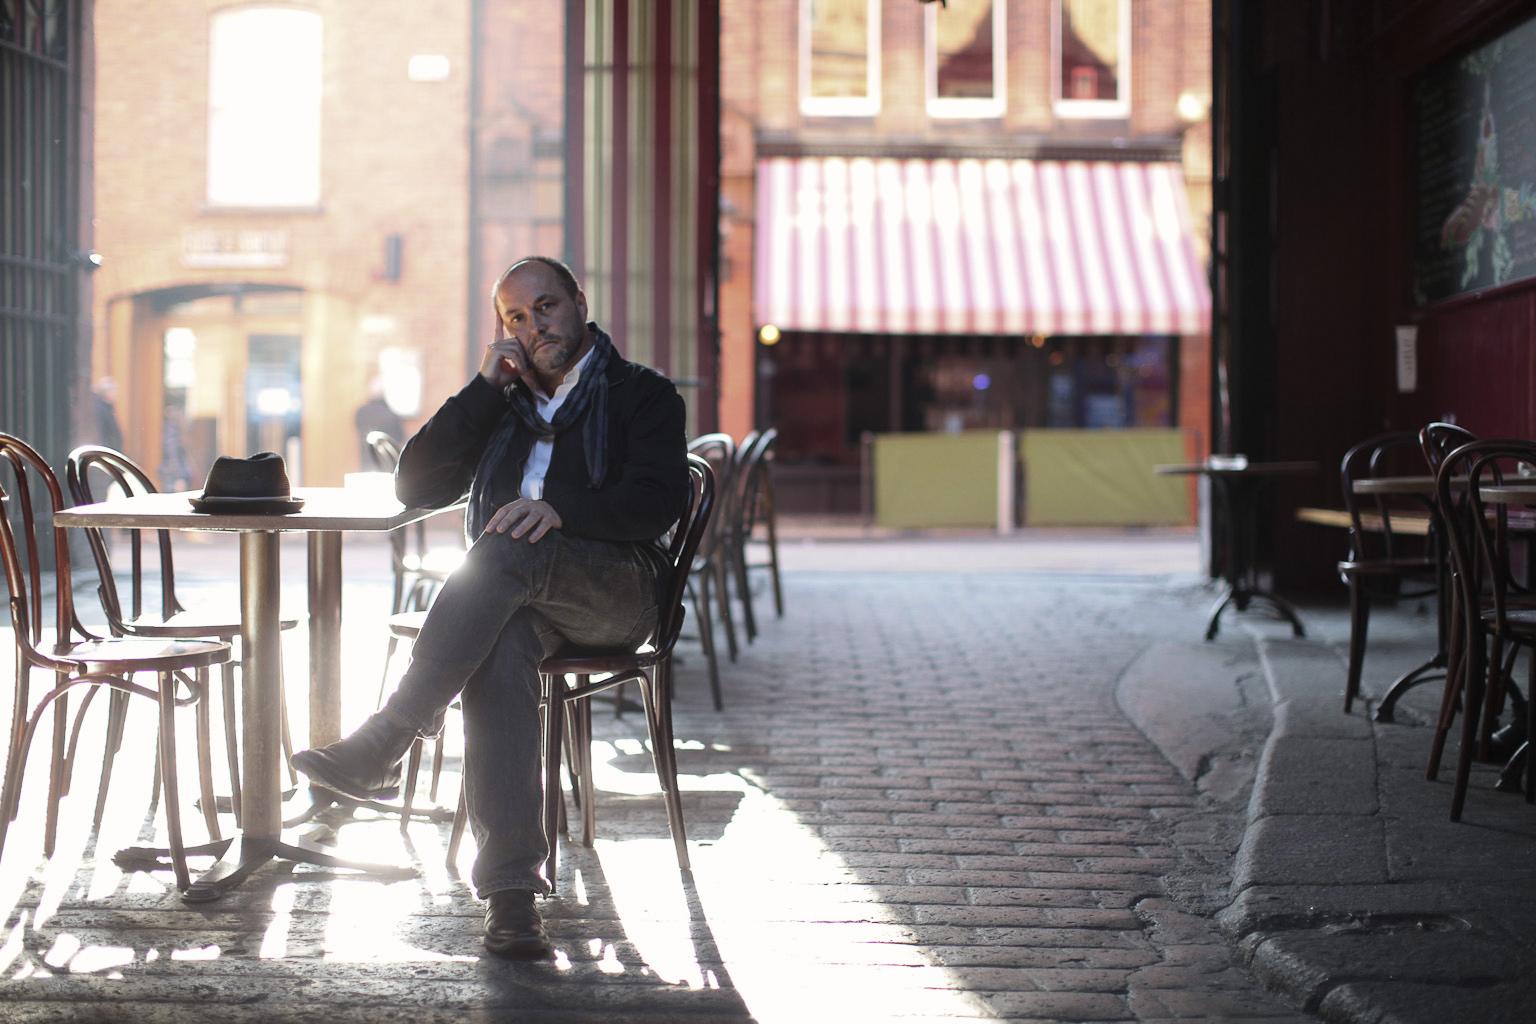 Colum McCann: The words that matter